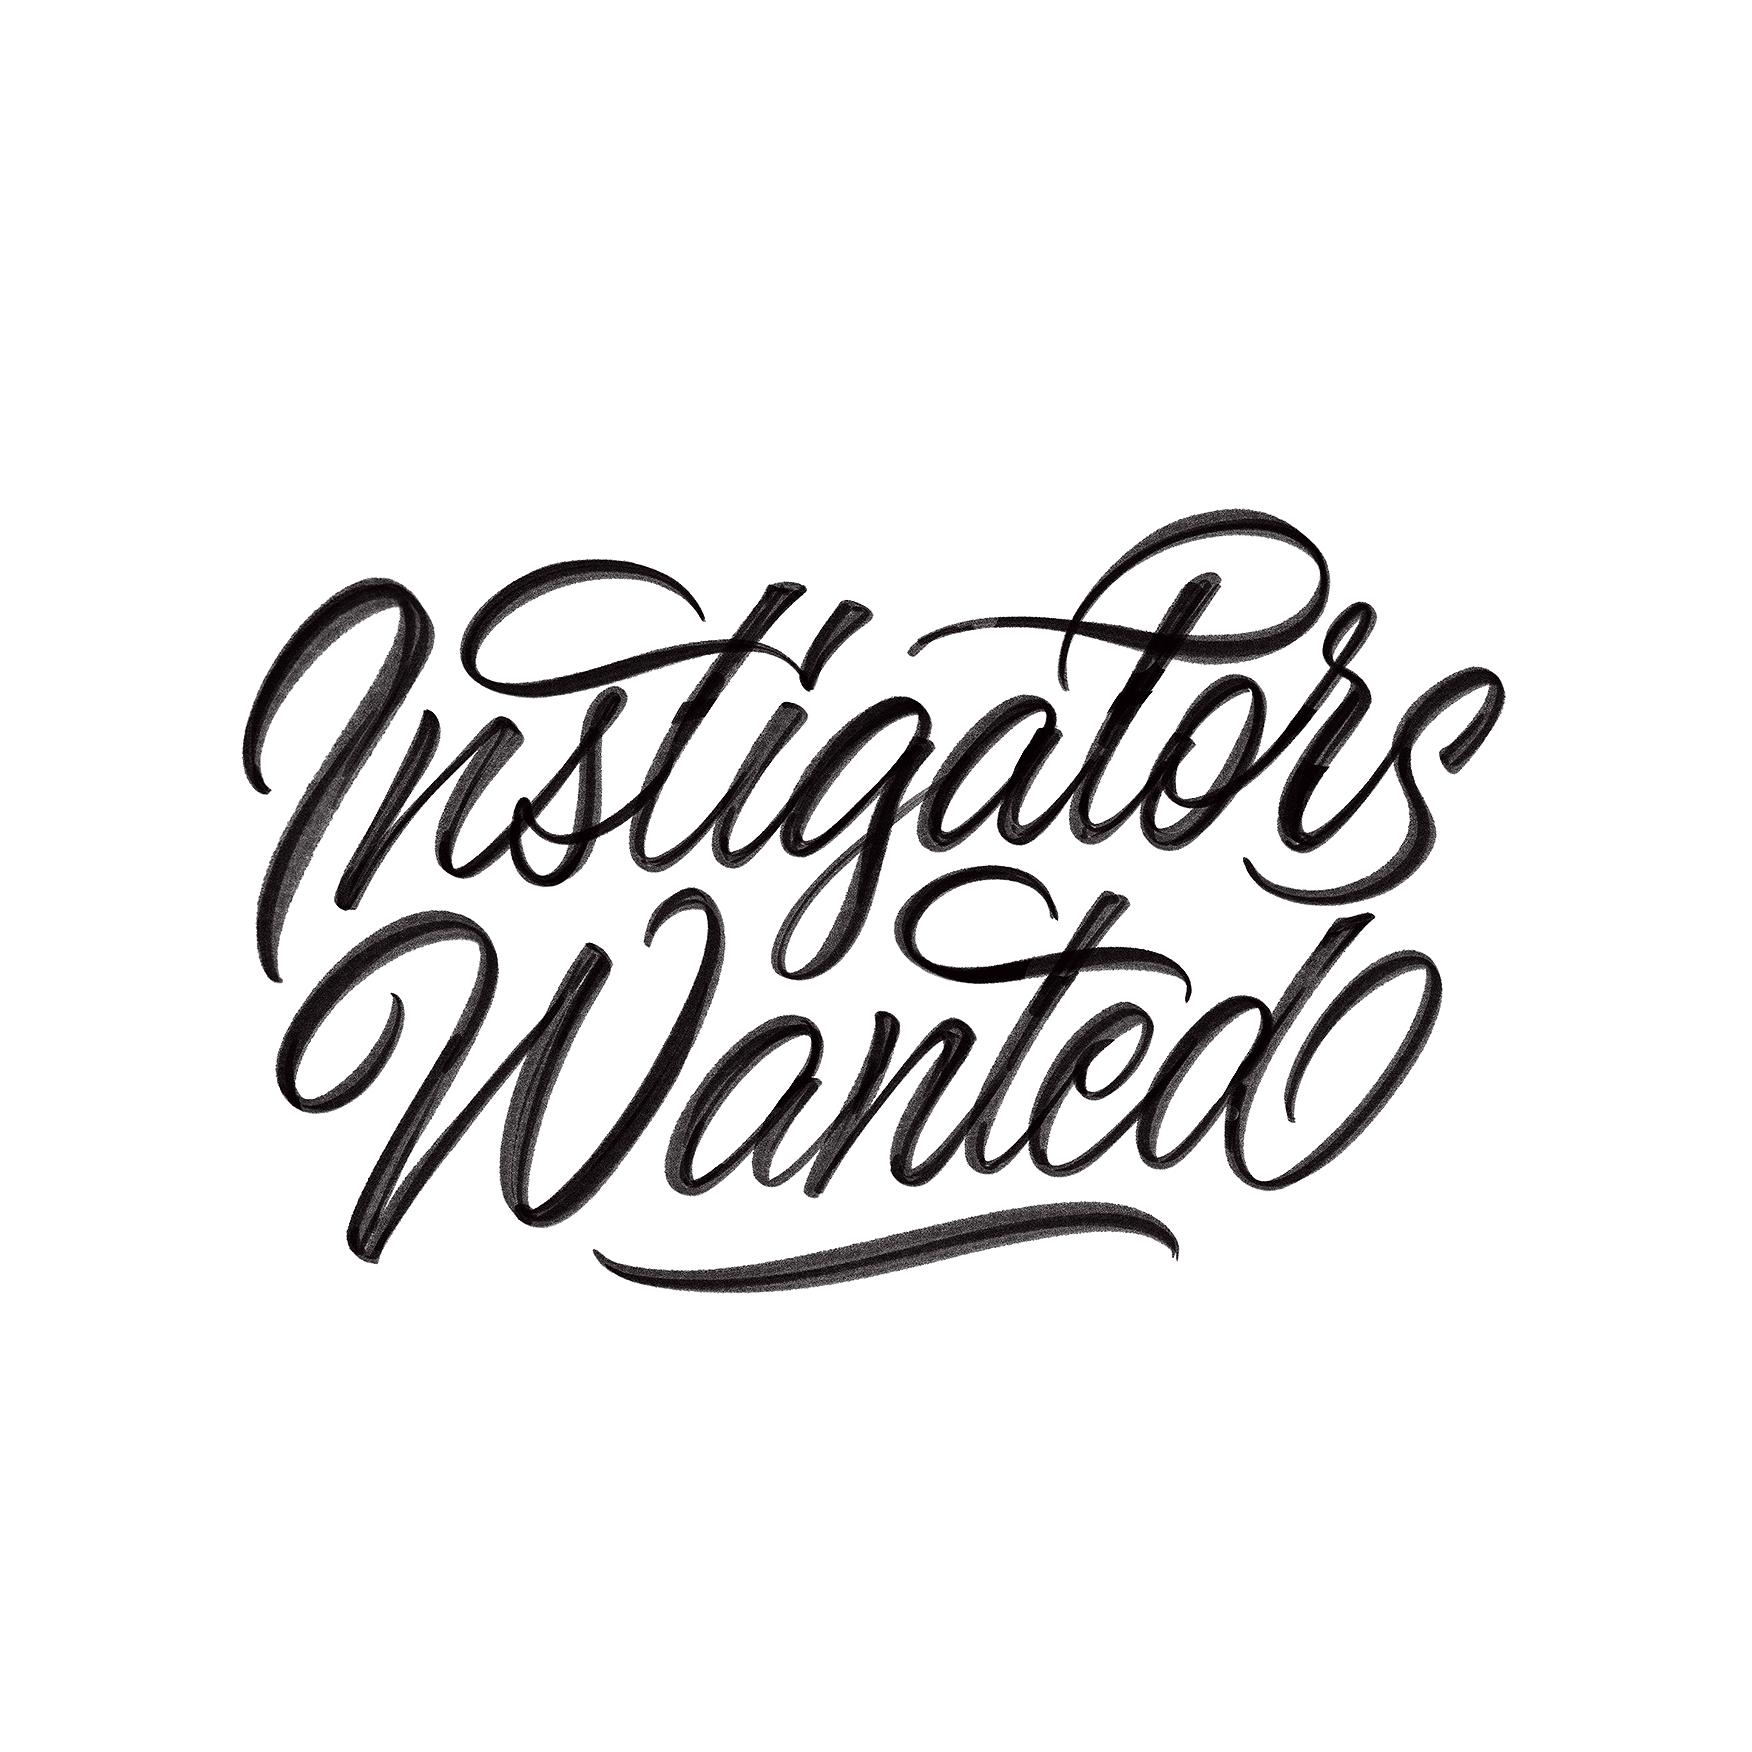 InstigatorsWanted_MichaelMoodie_2019.png